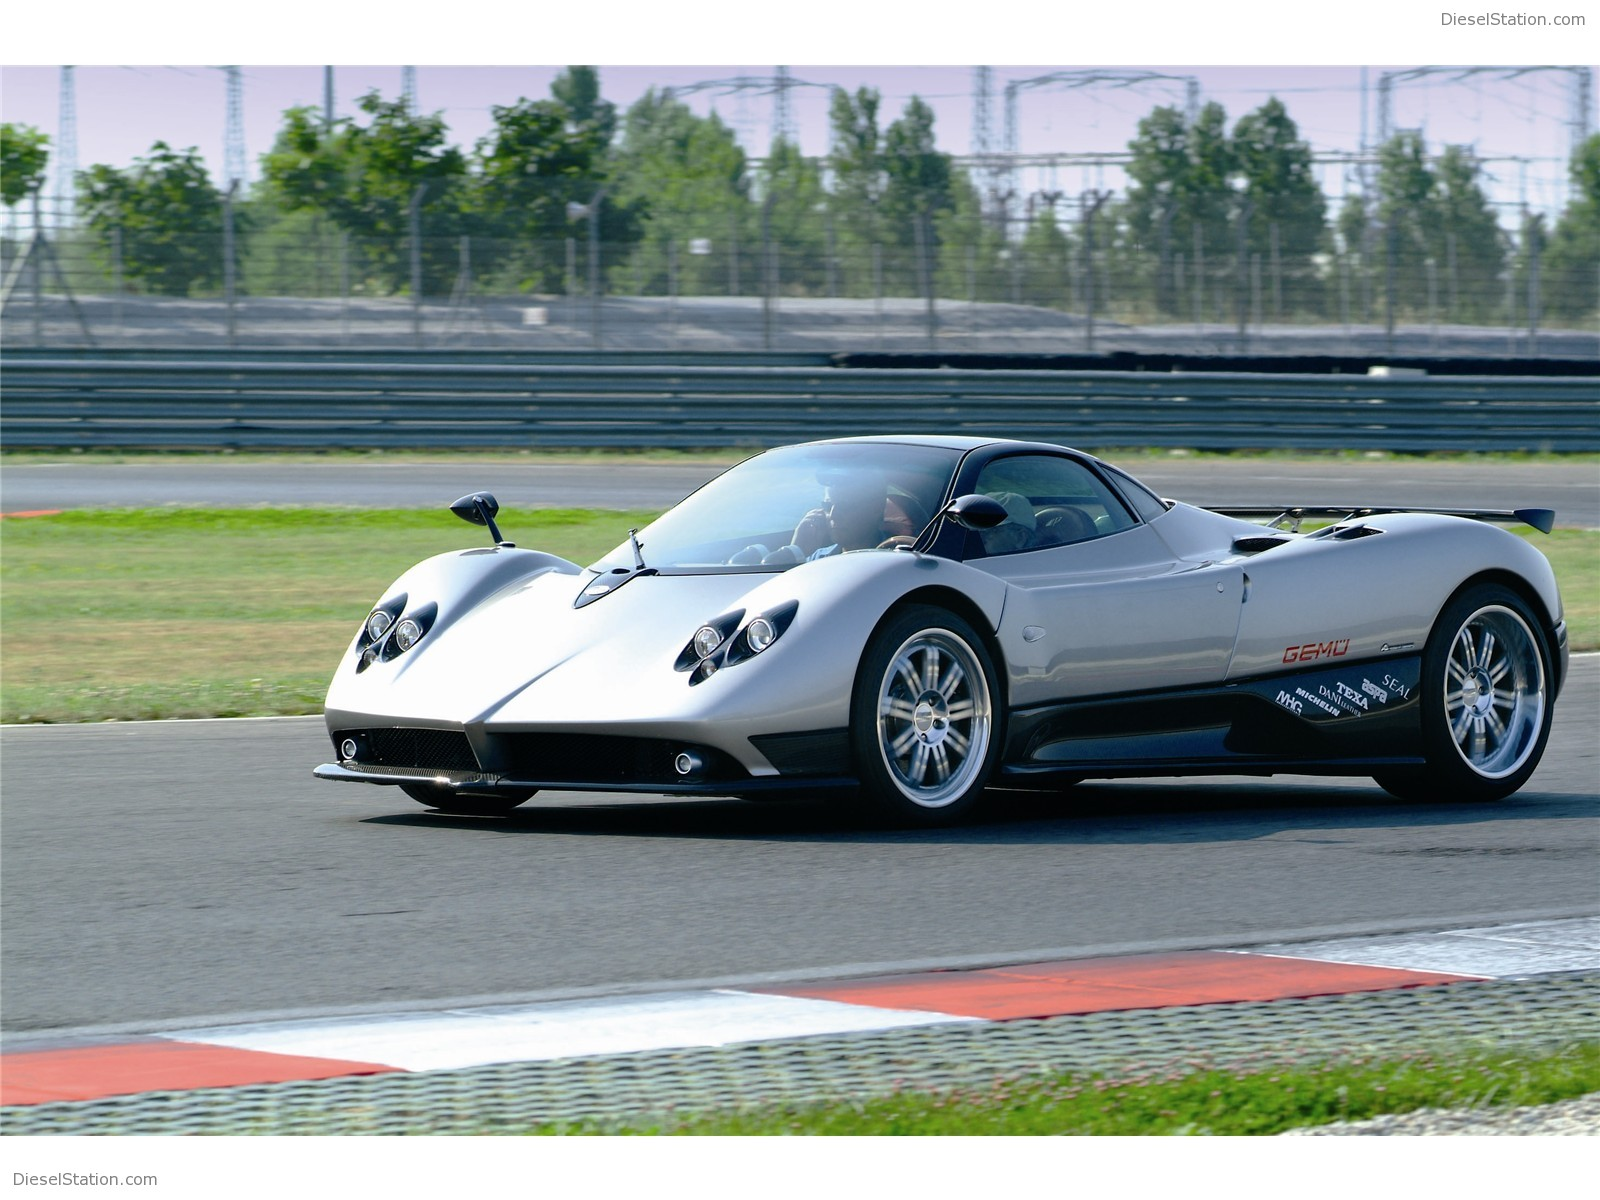 Pagani Zonda F Exotic Car Wallpapers #02 of 22 : Diesel ...